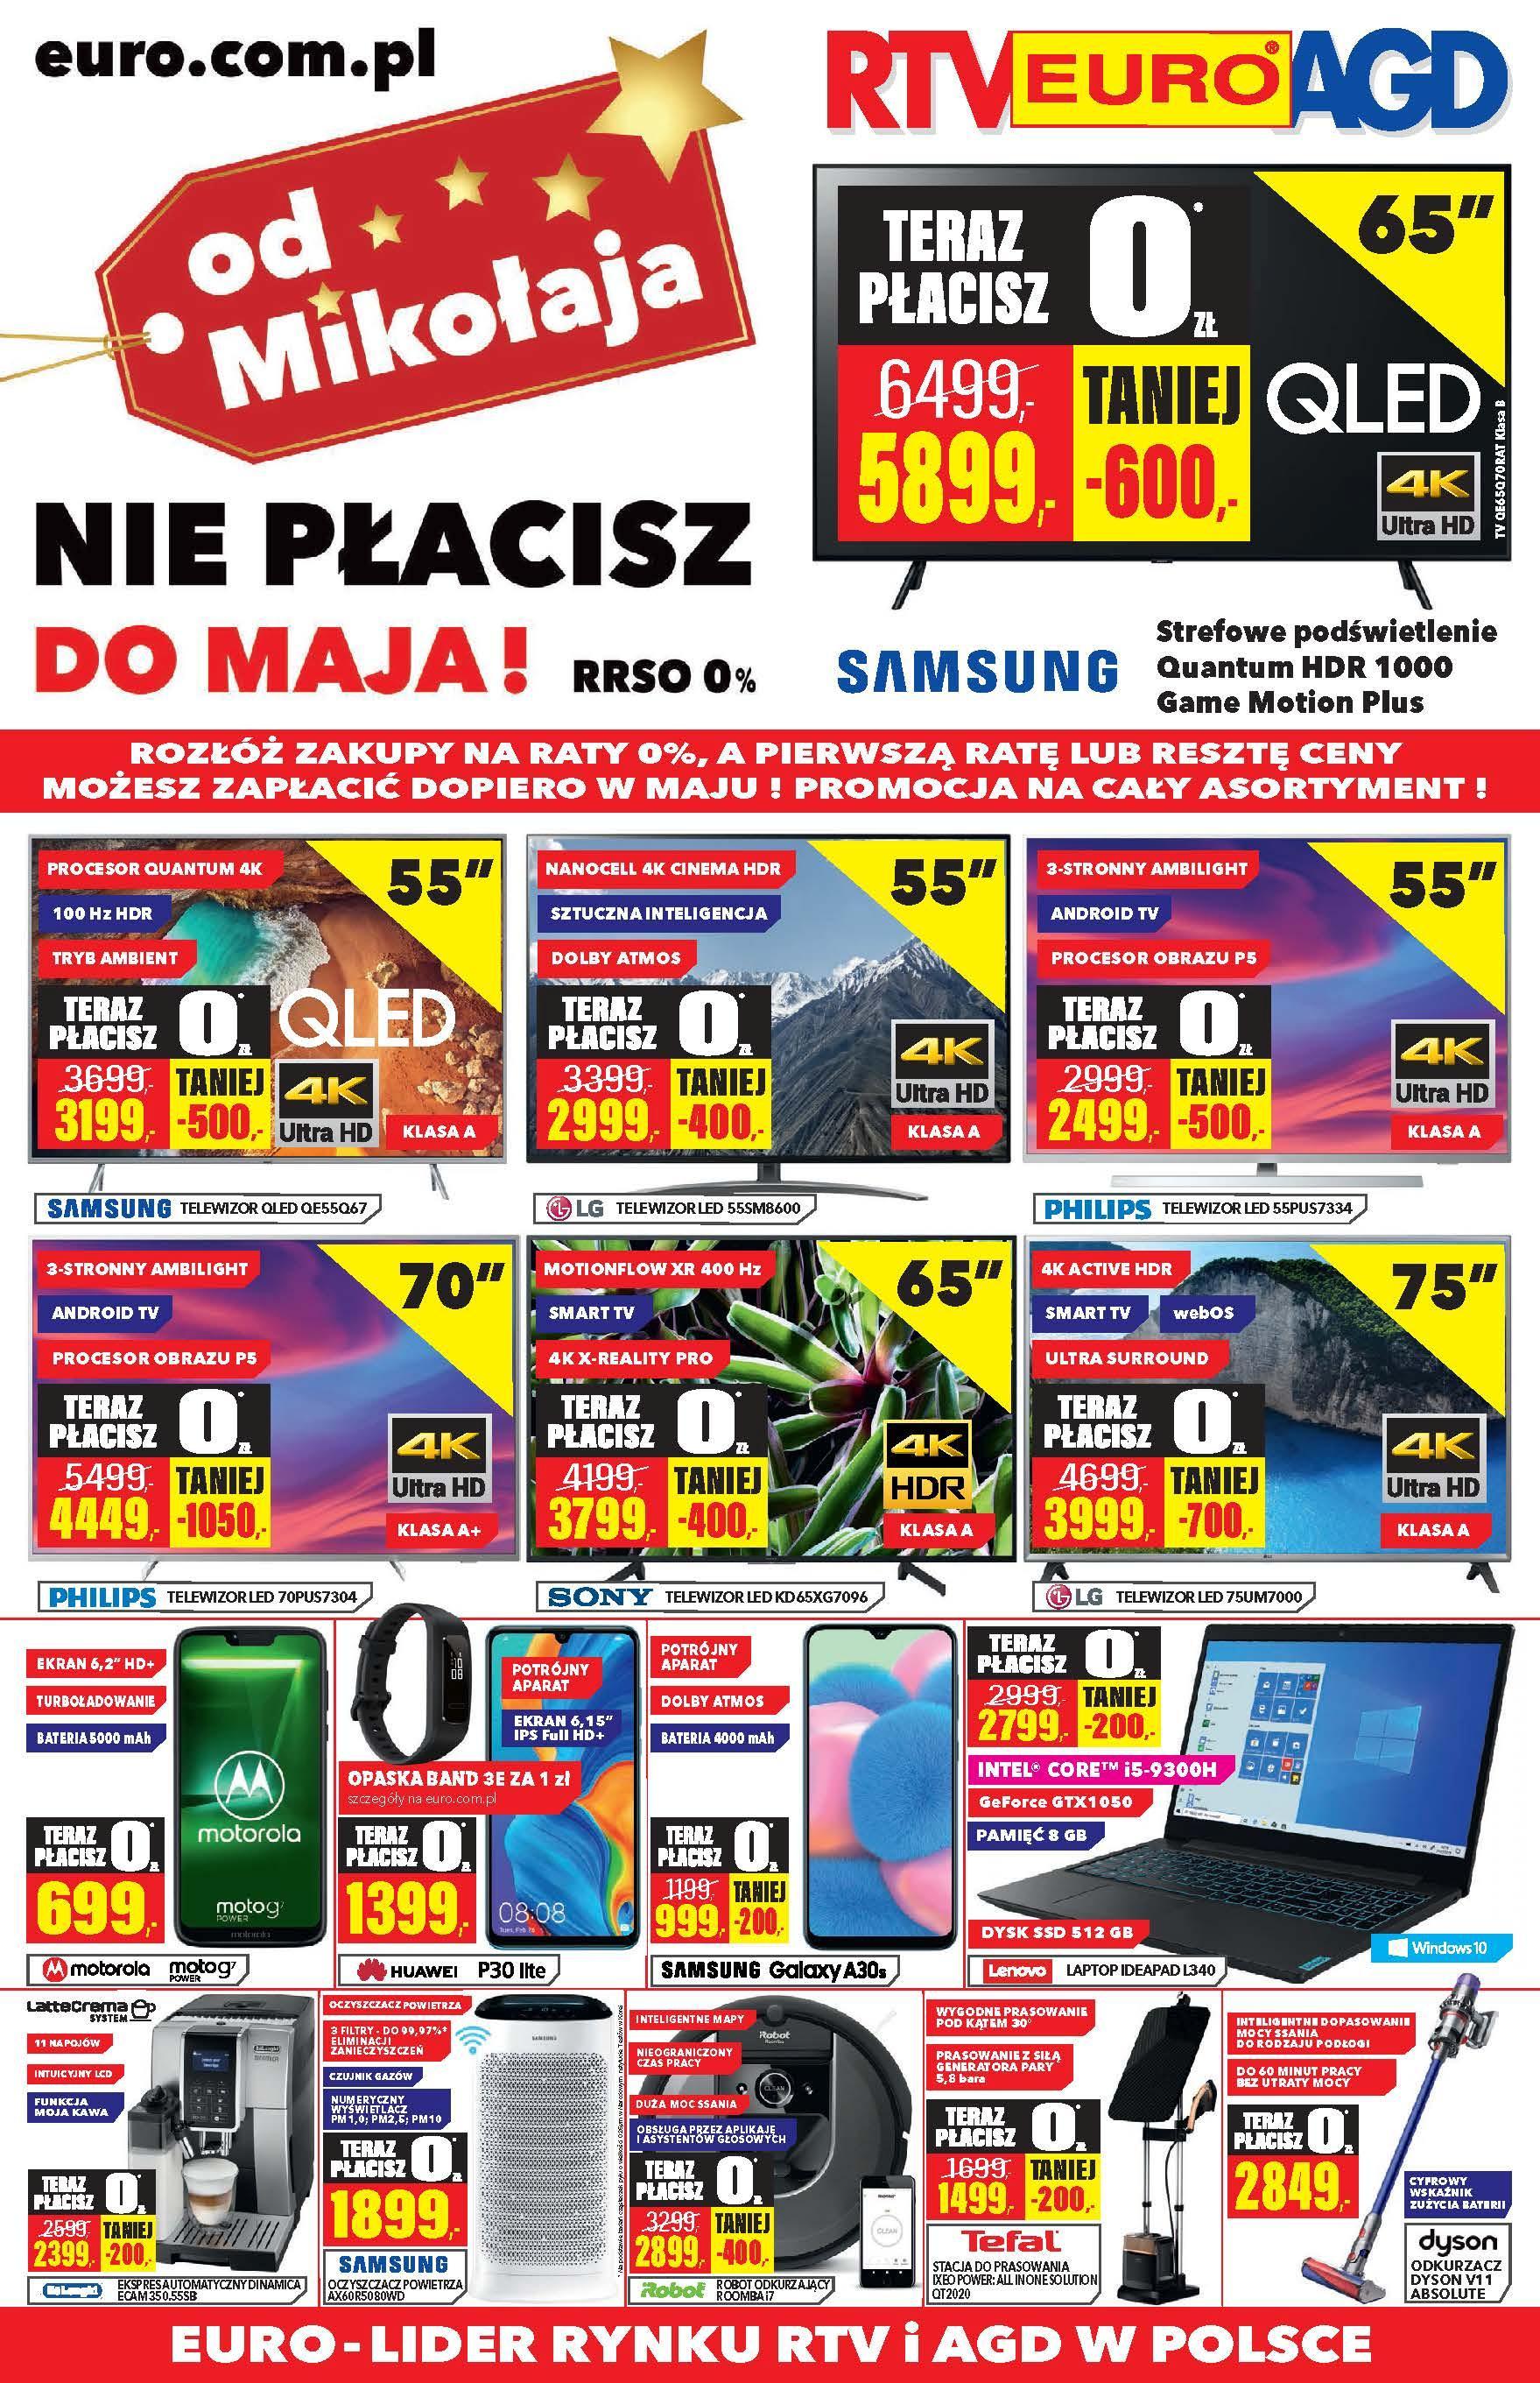 Gazetka promocyjna RTV Euro AGD do 31/12/2019 str.1